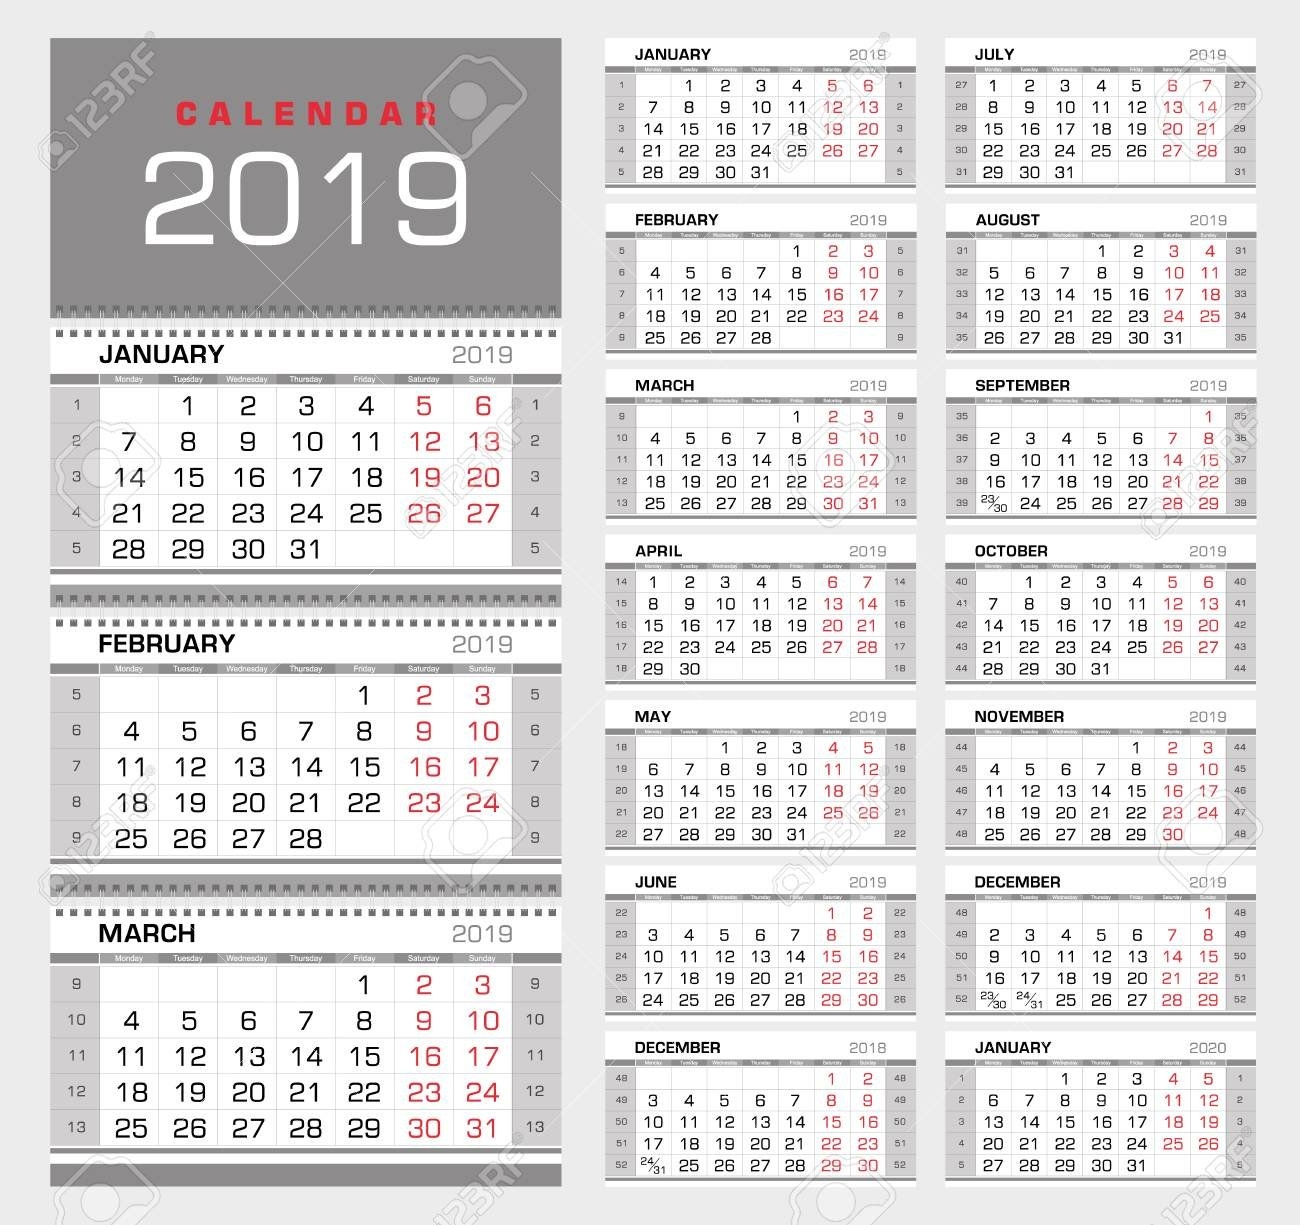 Wall Quarterly Calendar 2019 With Week Numbers. Week Start From Week 9 Calendar 2019